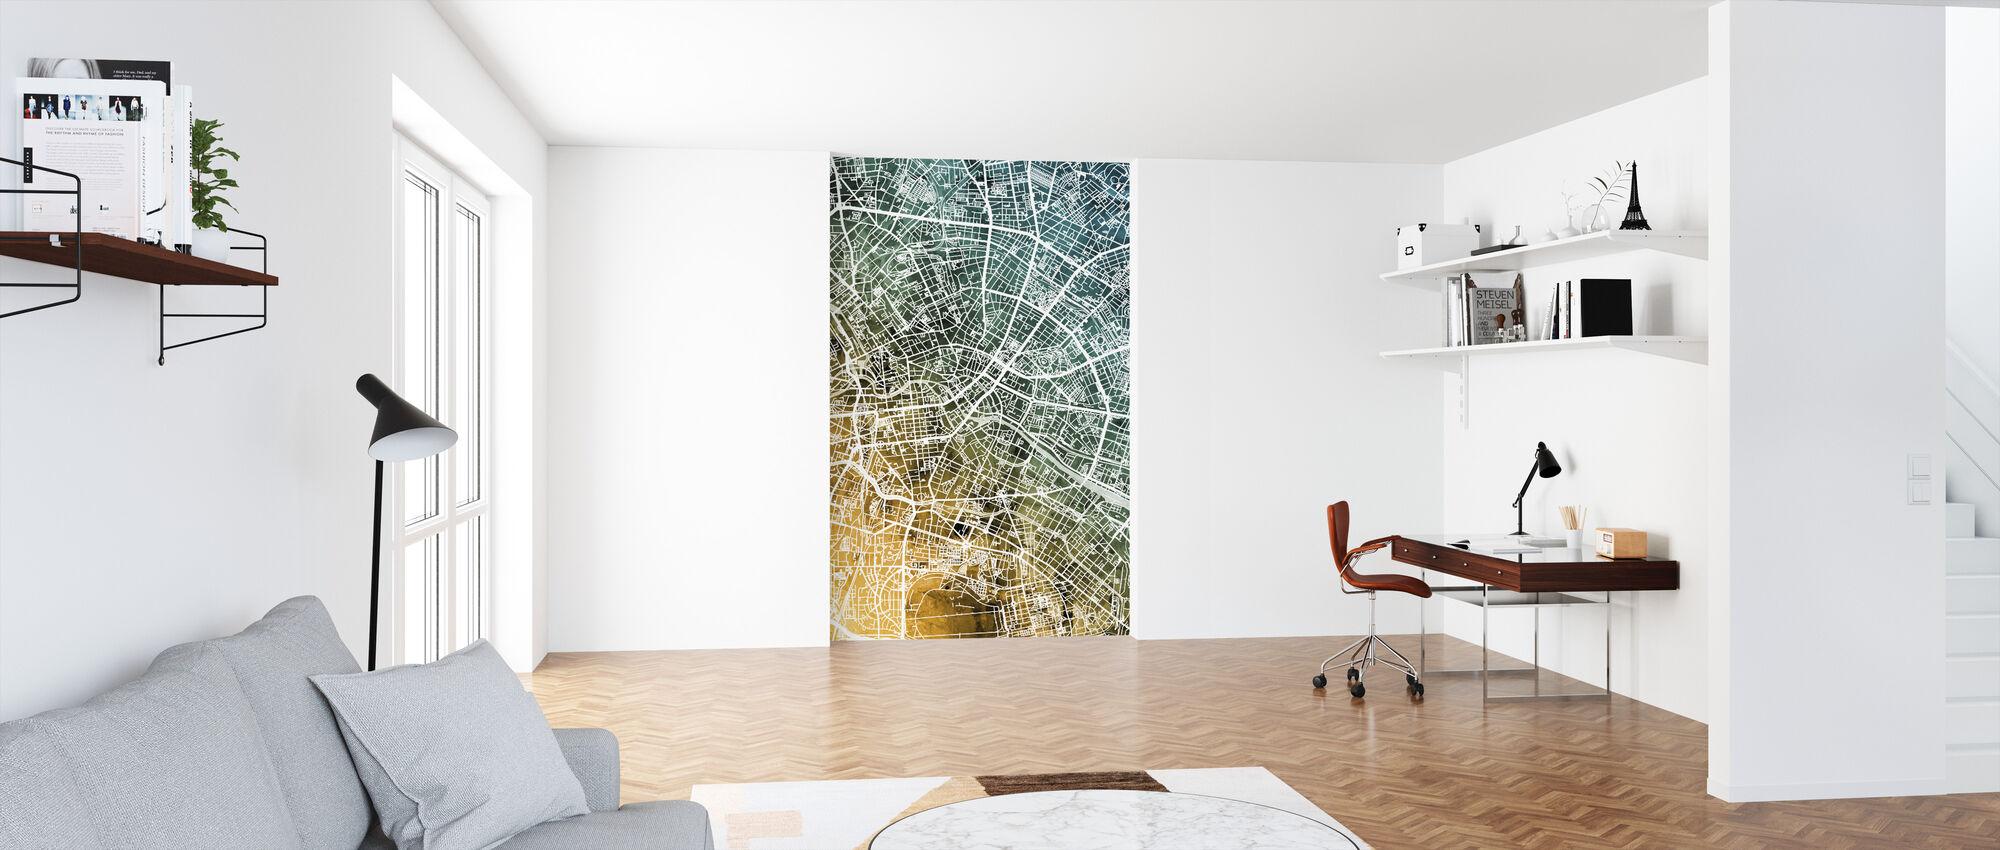 Berlin Tyskland City Karta - Tapet - Kontor